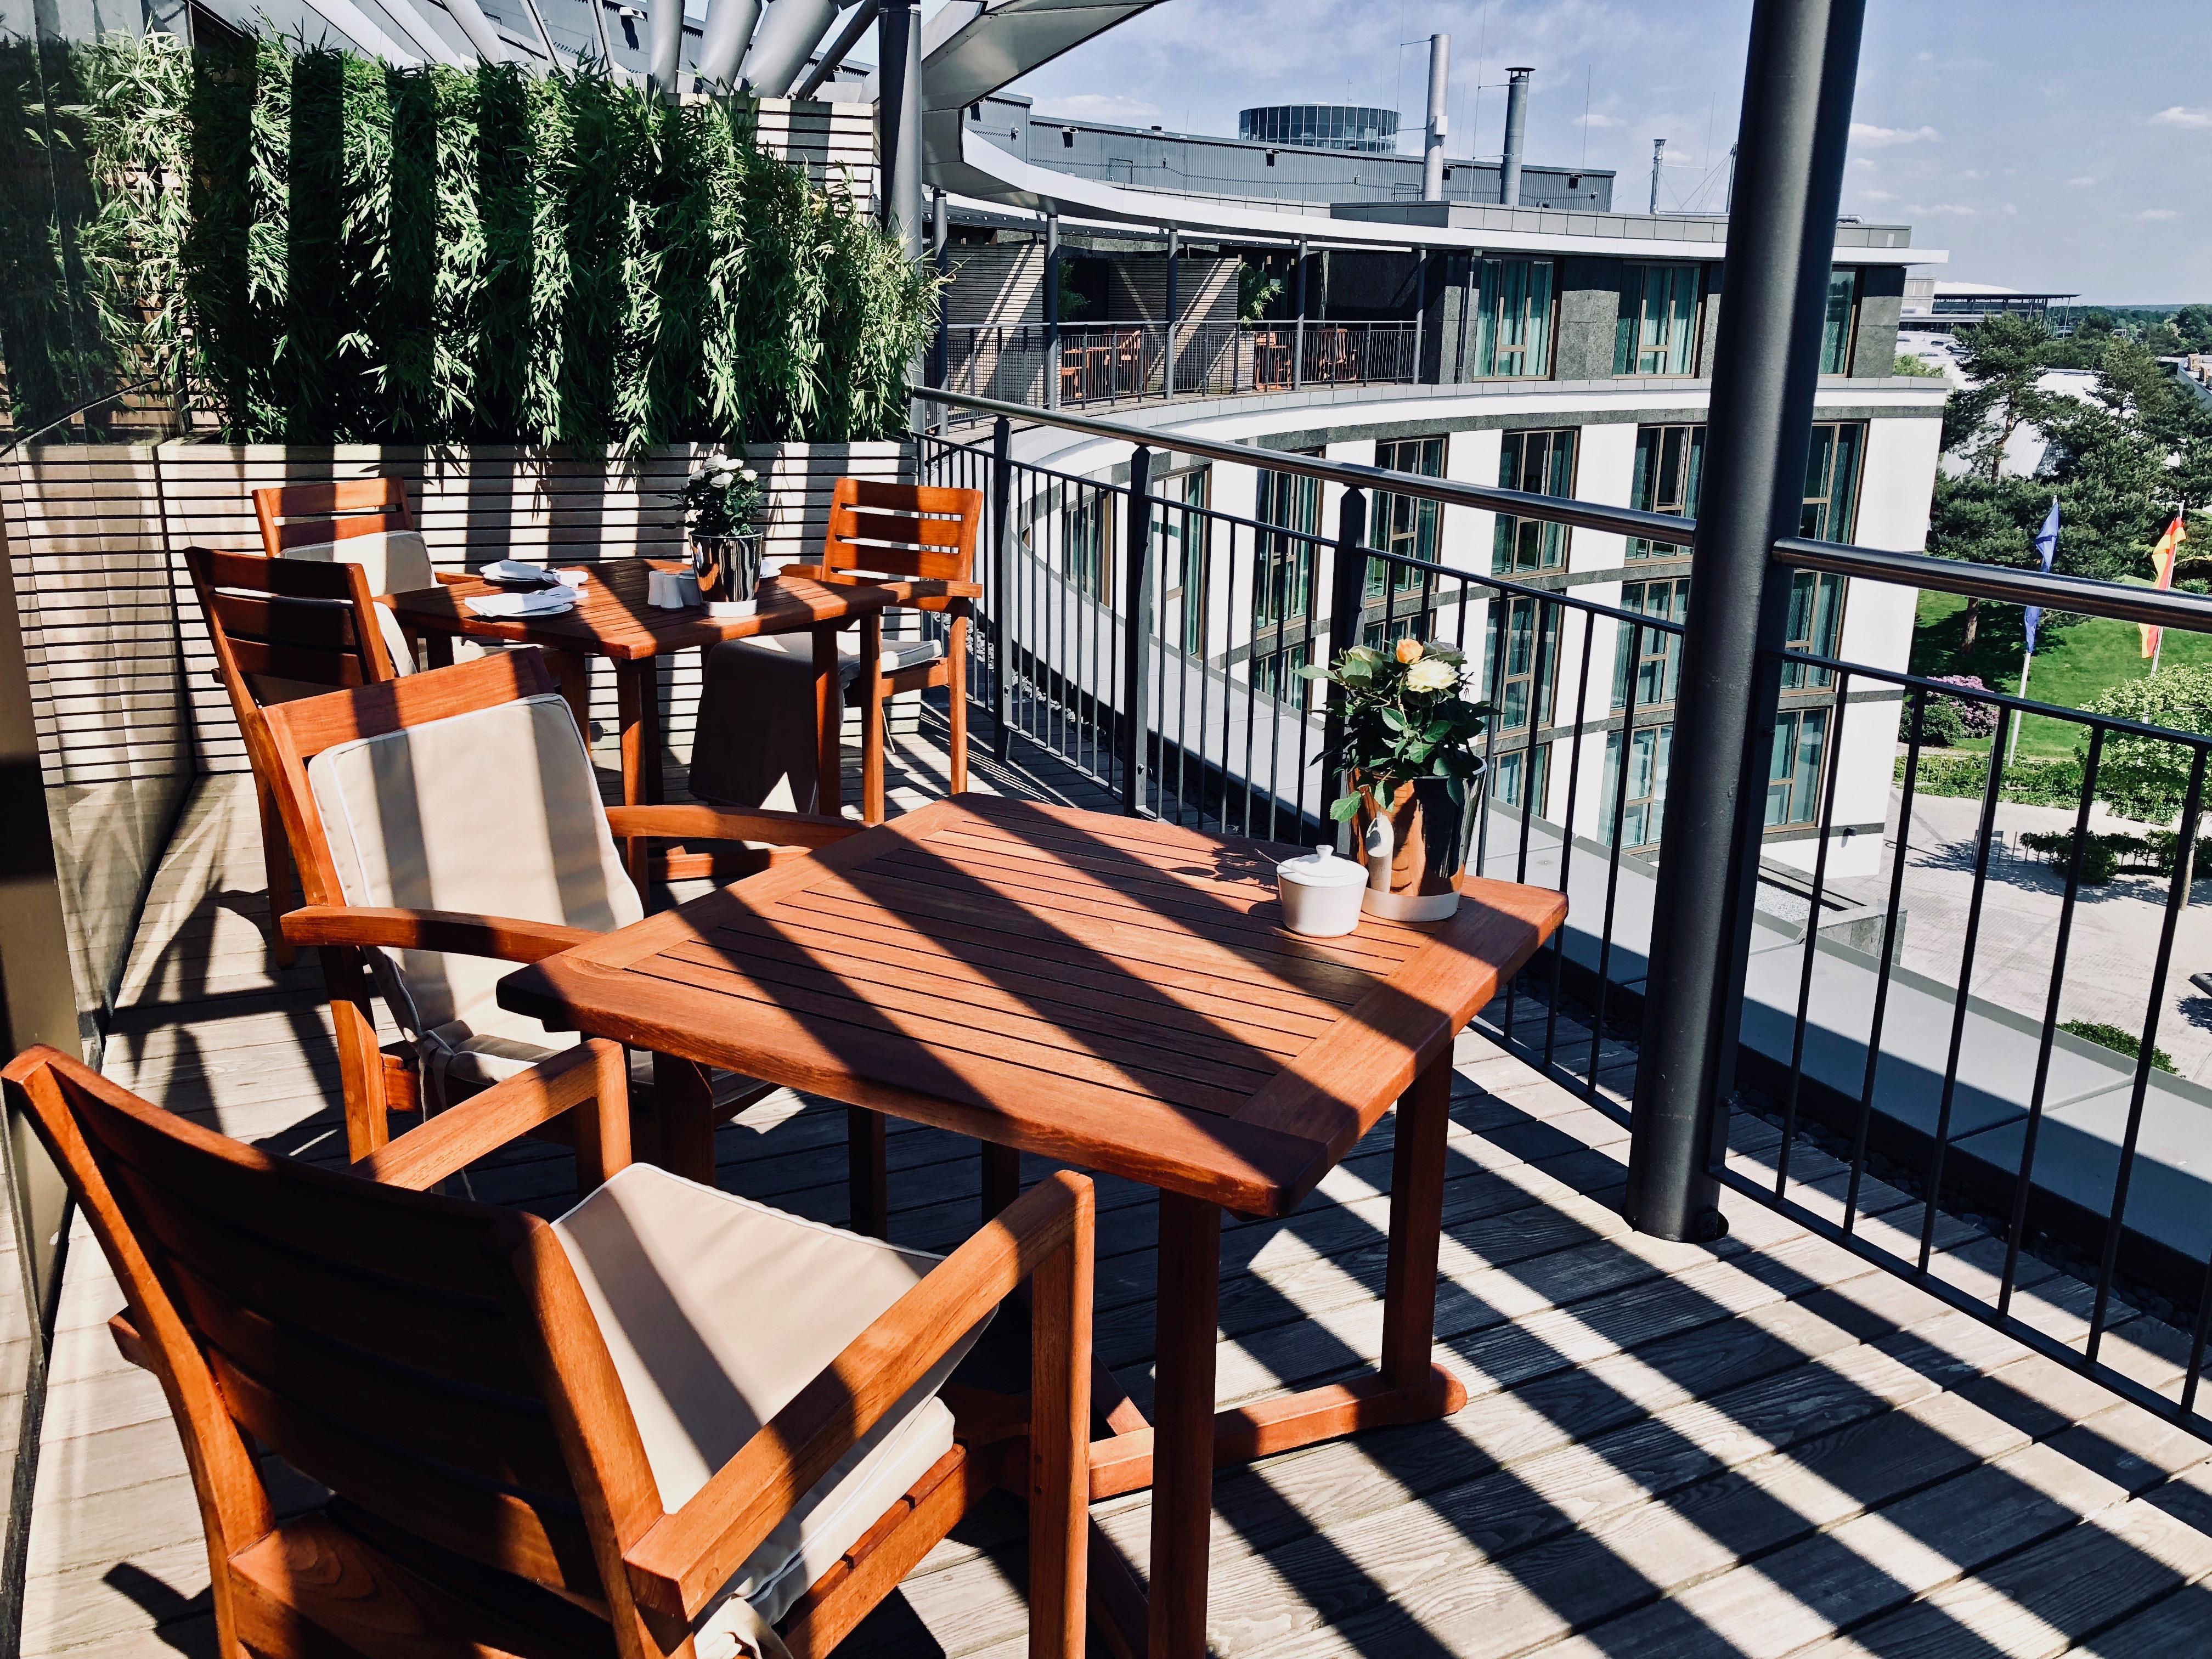 The Ritz-Carlton Wolfsburg Club Lounge Terrasse